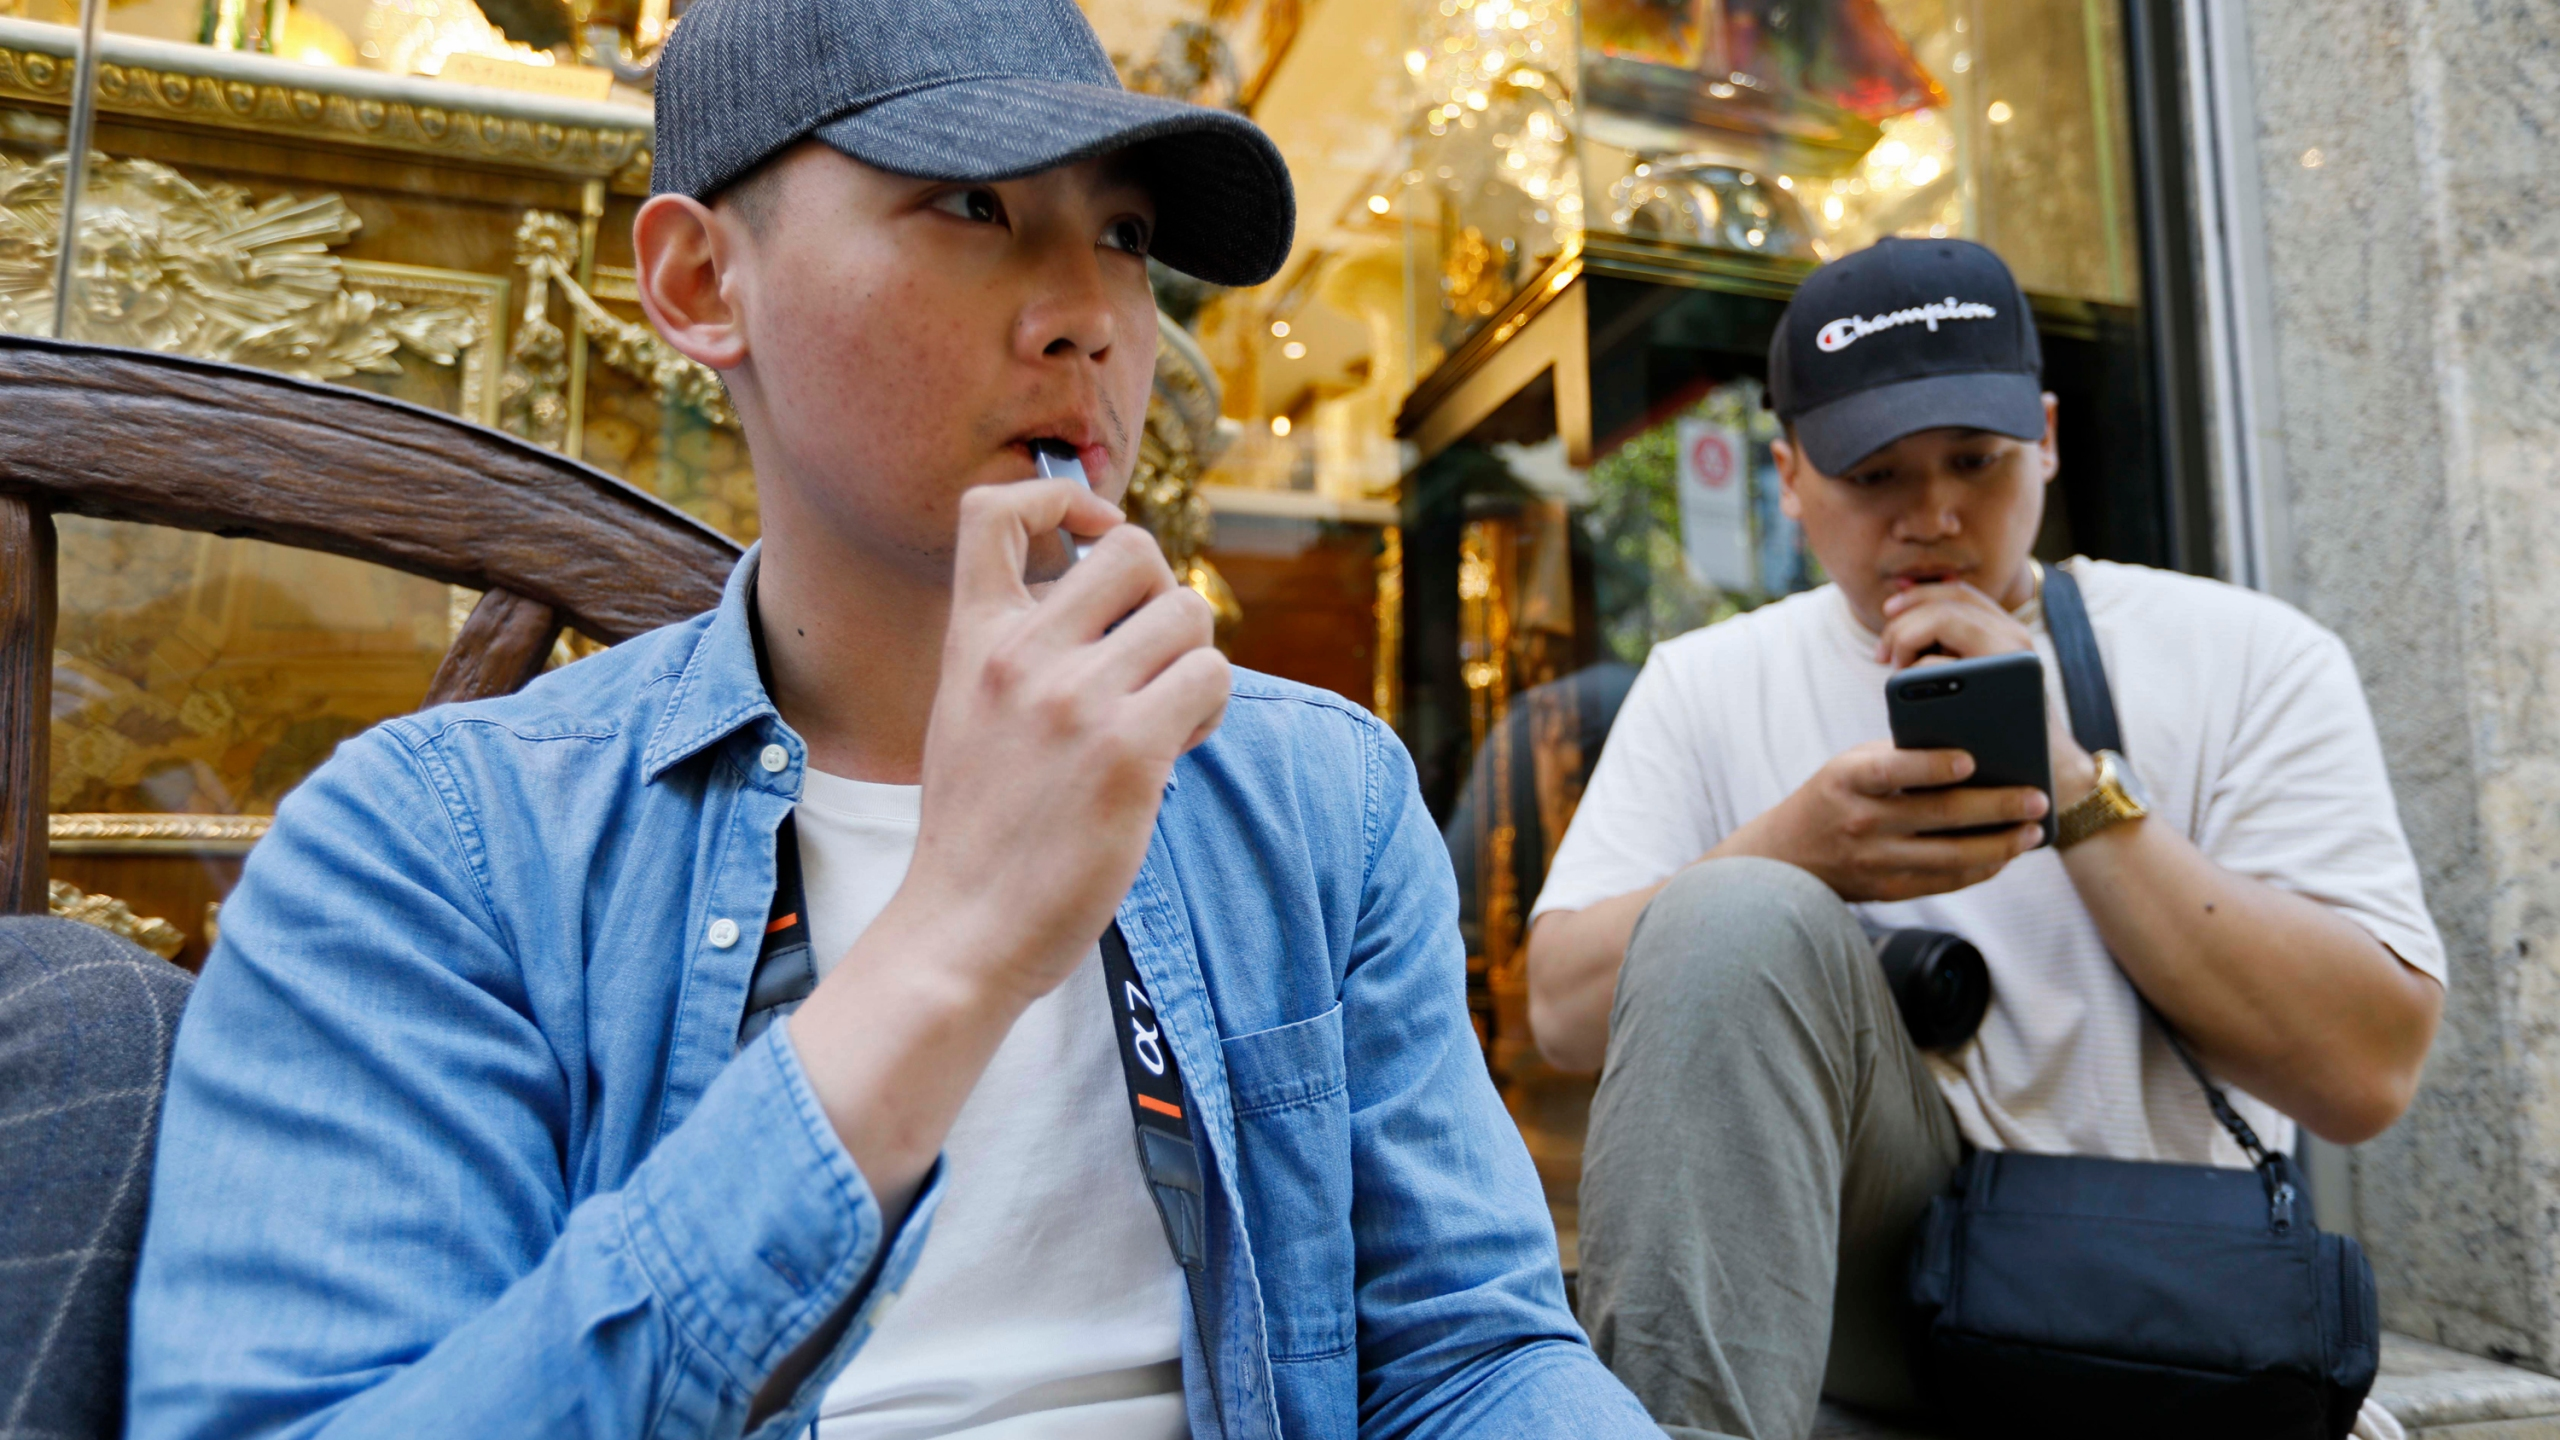 San Francisco E Cigarette Ban_1560880543398